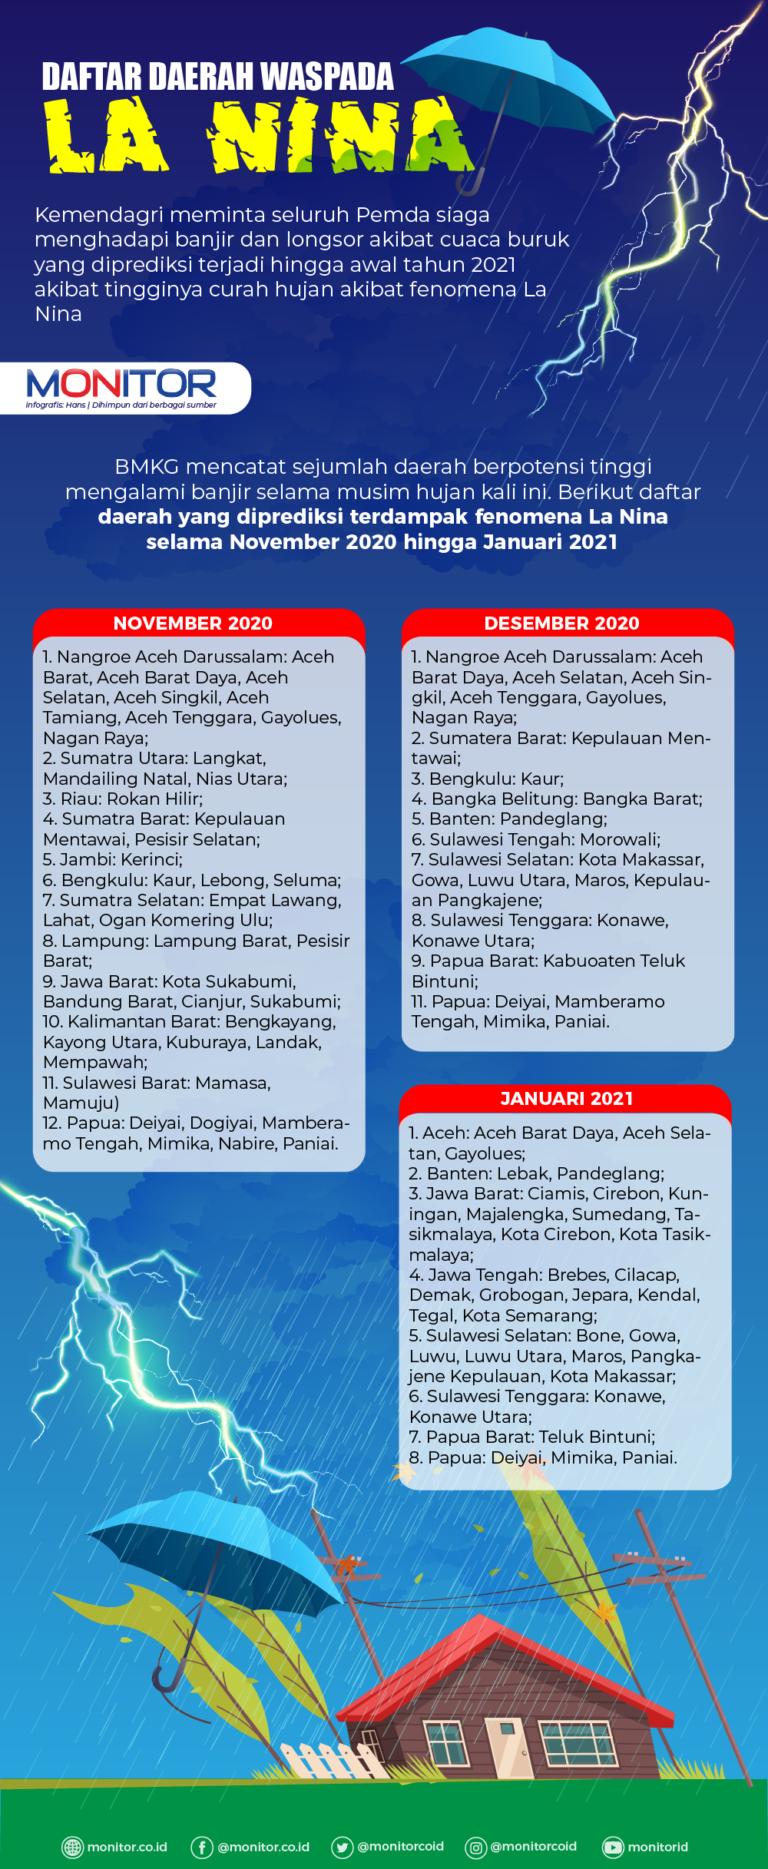 Daftar Daerah Waspada La Nina